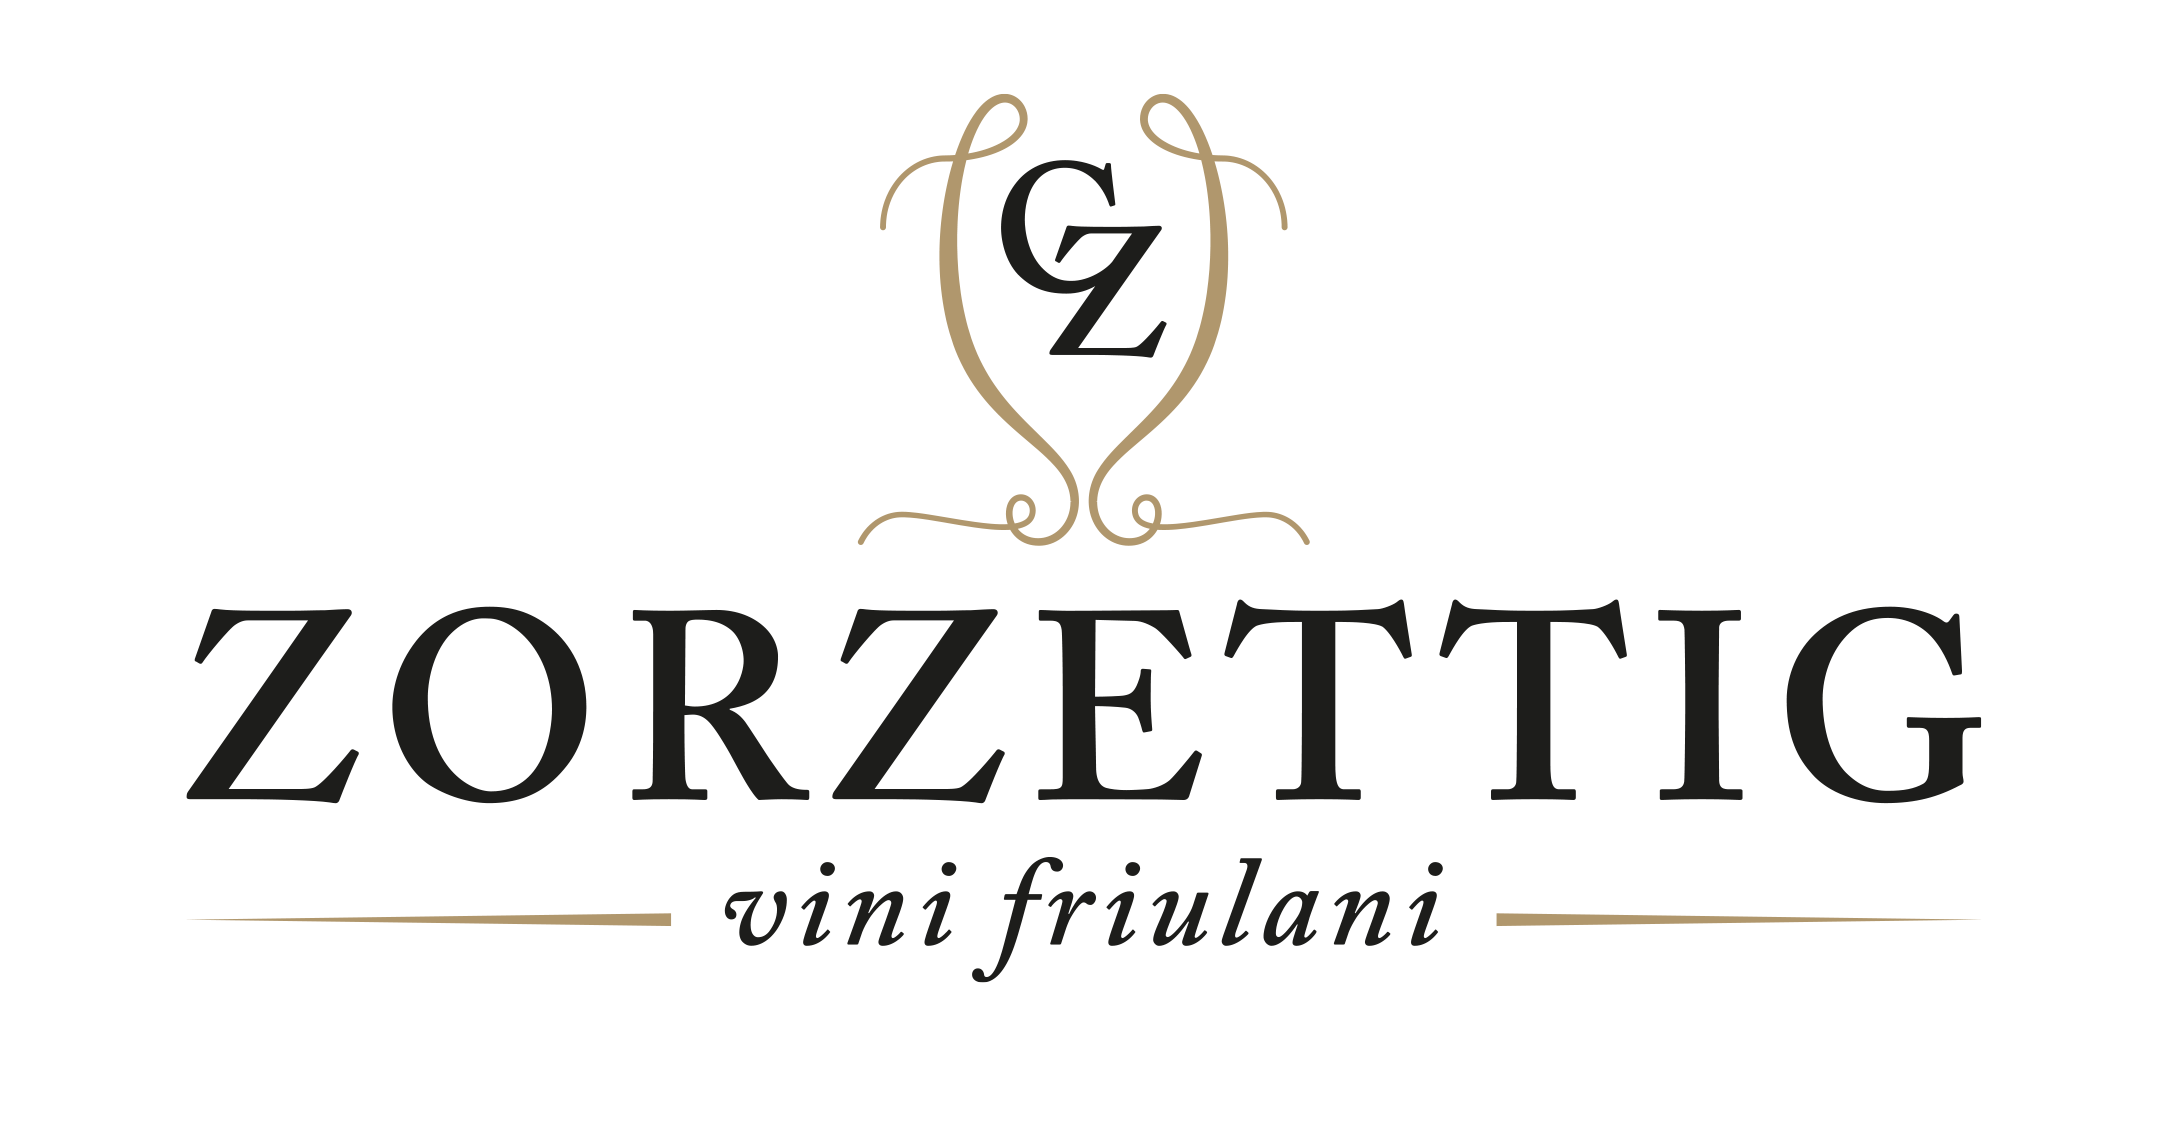 Zorzettig Logo